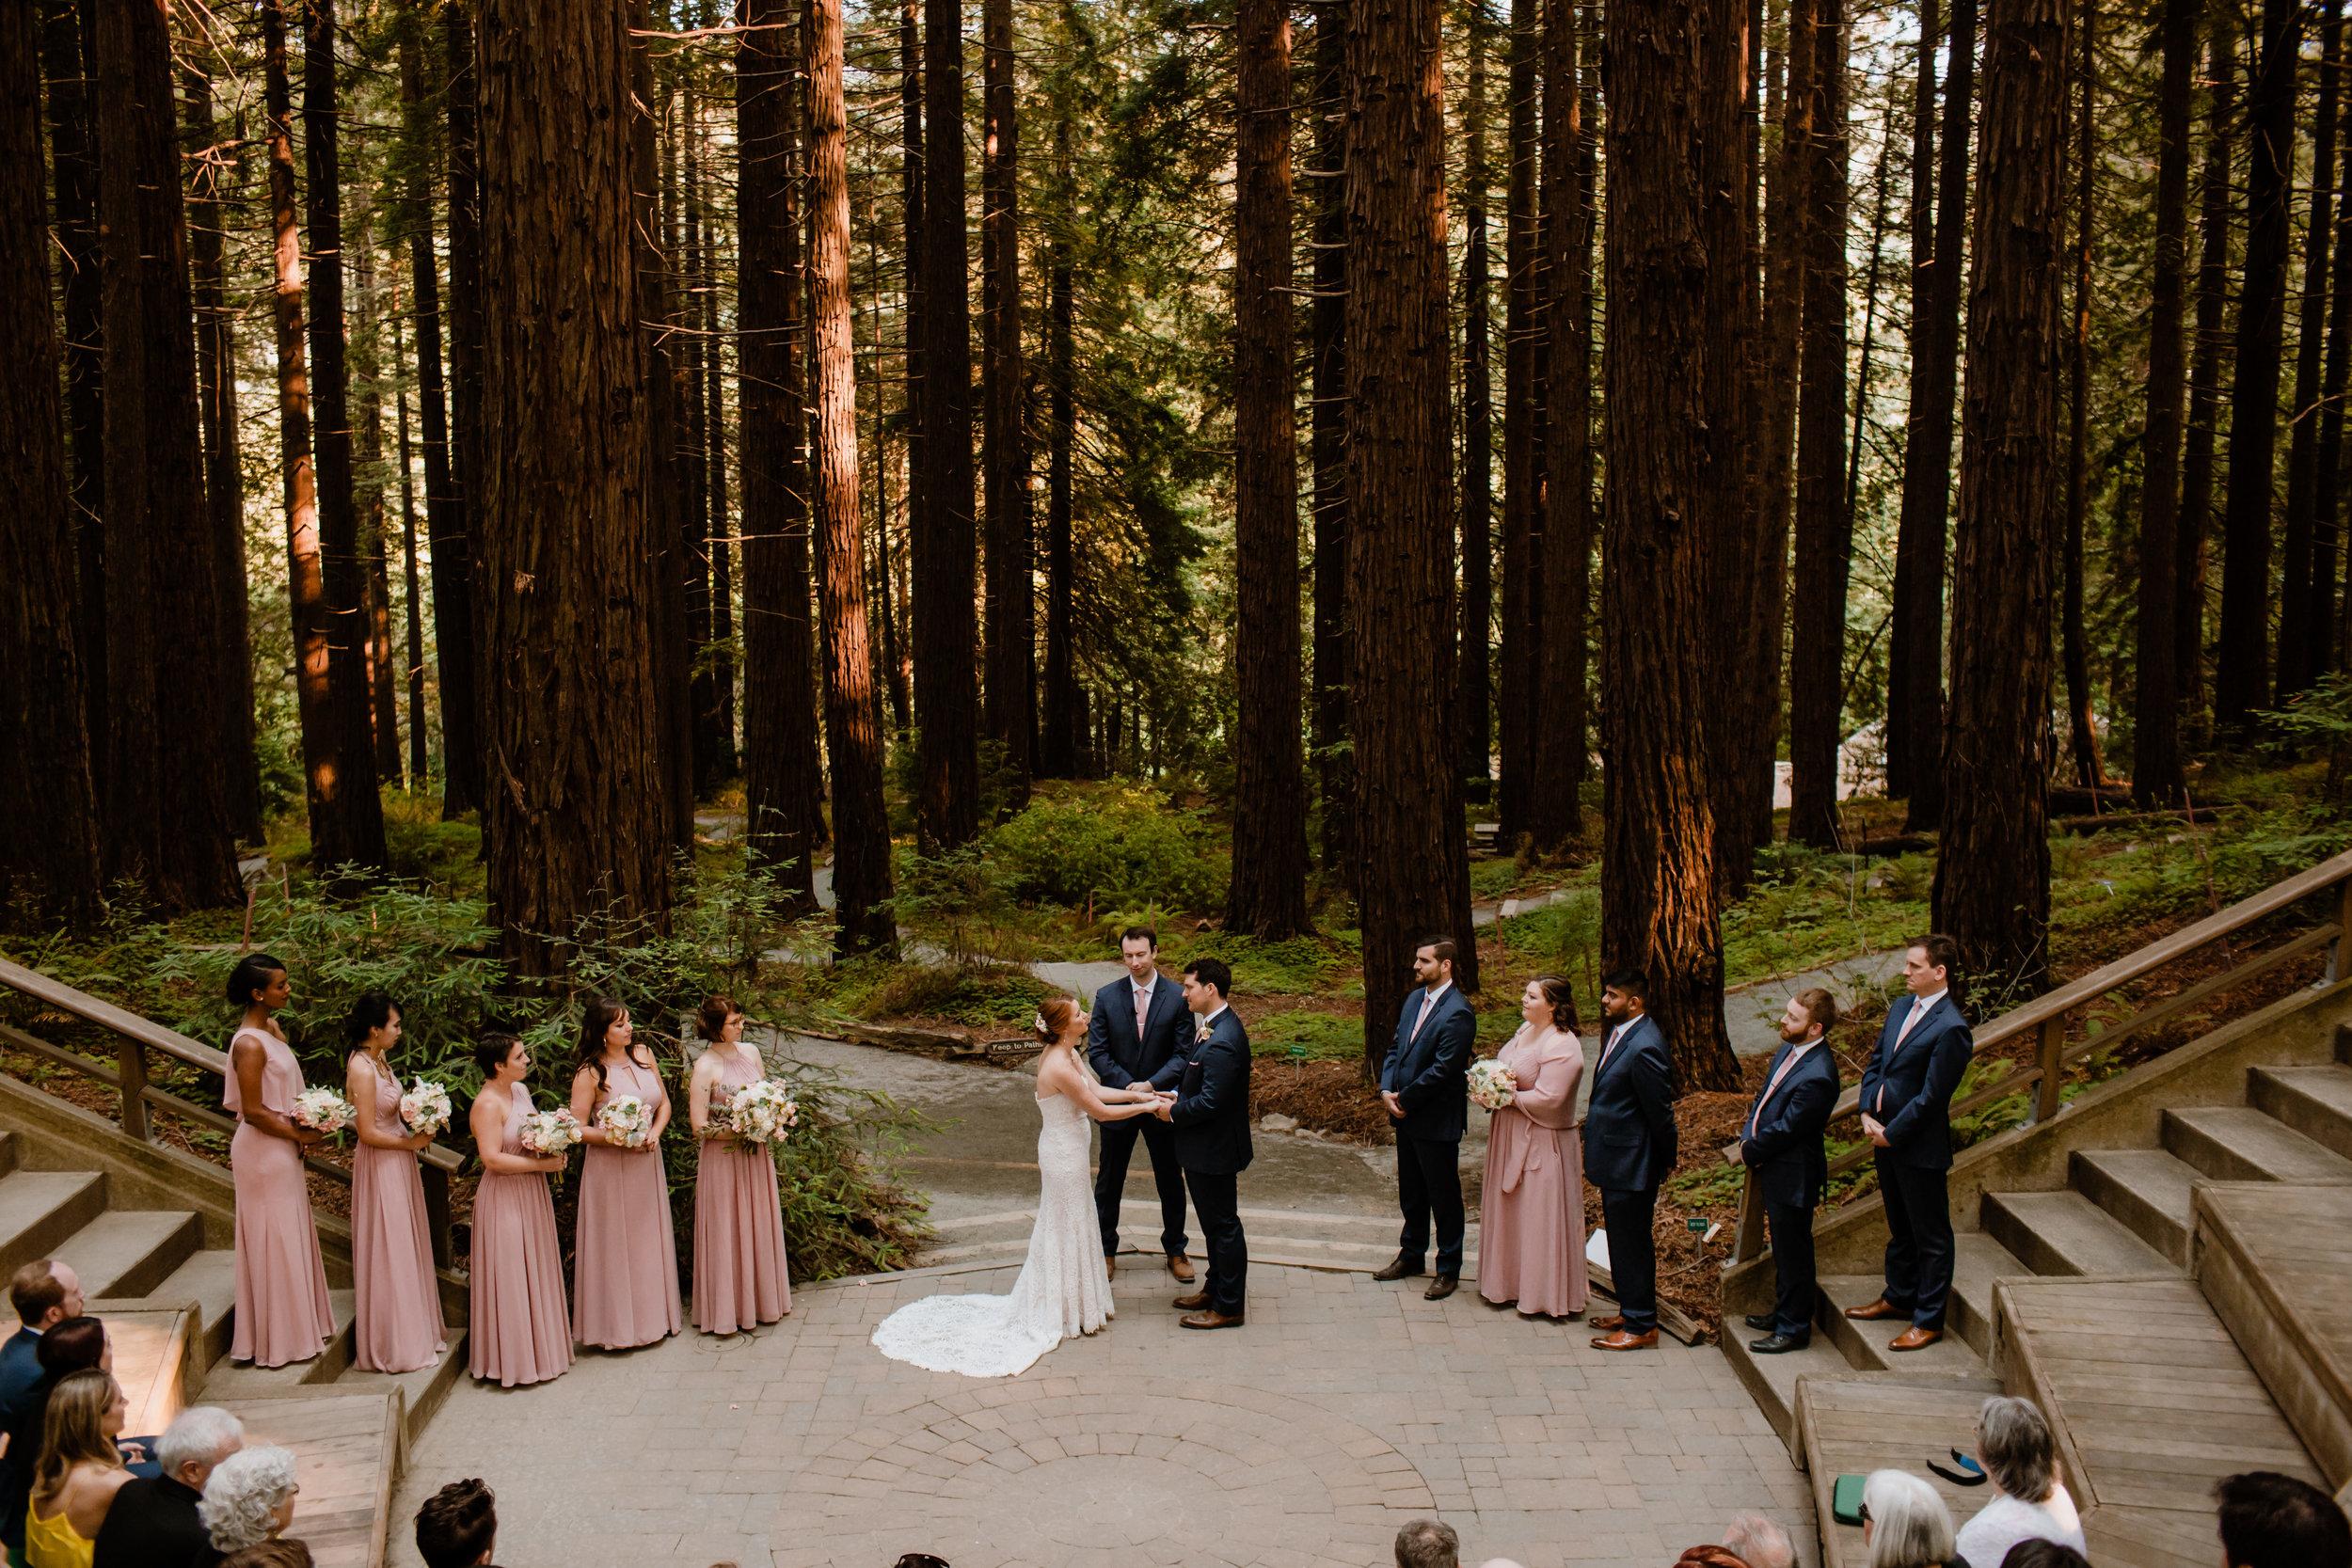 Shauna_and_Craig_UC_Berkeley_Botanical_Garden_Wedding_-_Eve_Rox_Photography_-440.jpg